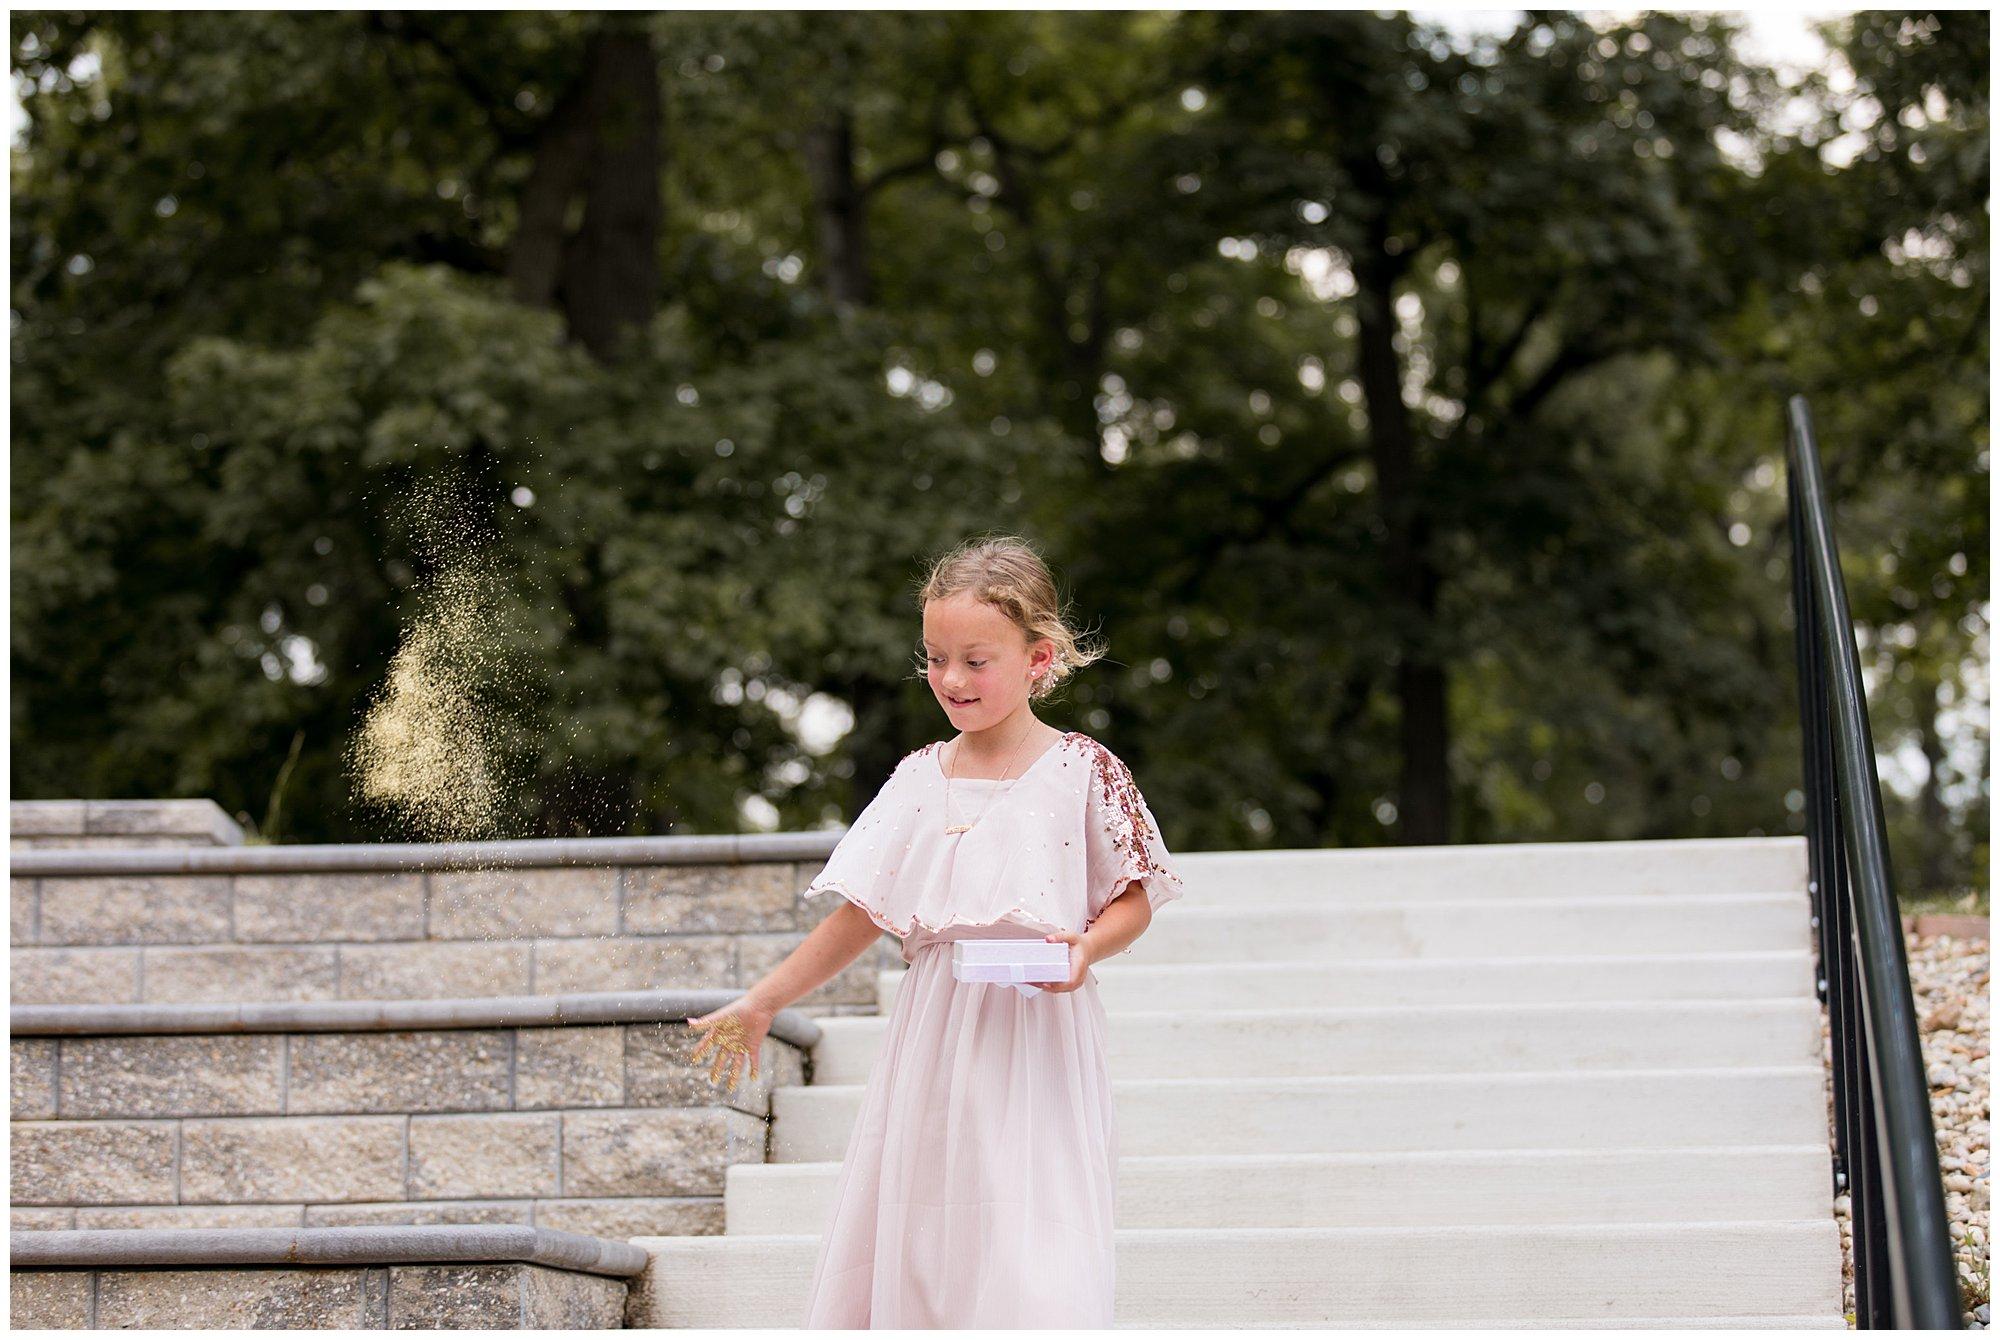 flower girl tosses glitter during wedding ceremony at Lucerne Park